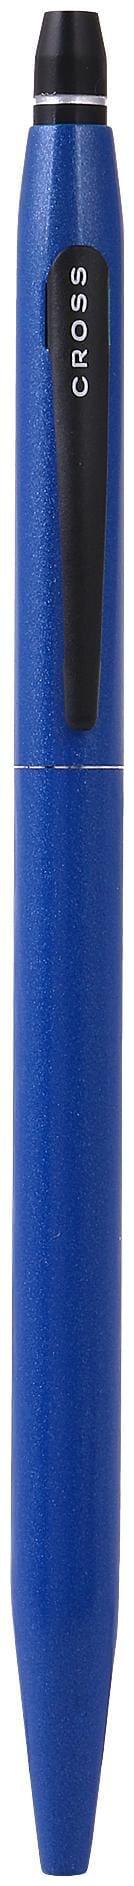 Cross Click Blue Gel Rb Pen